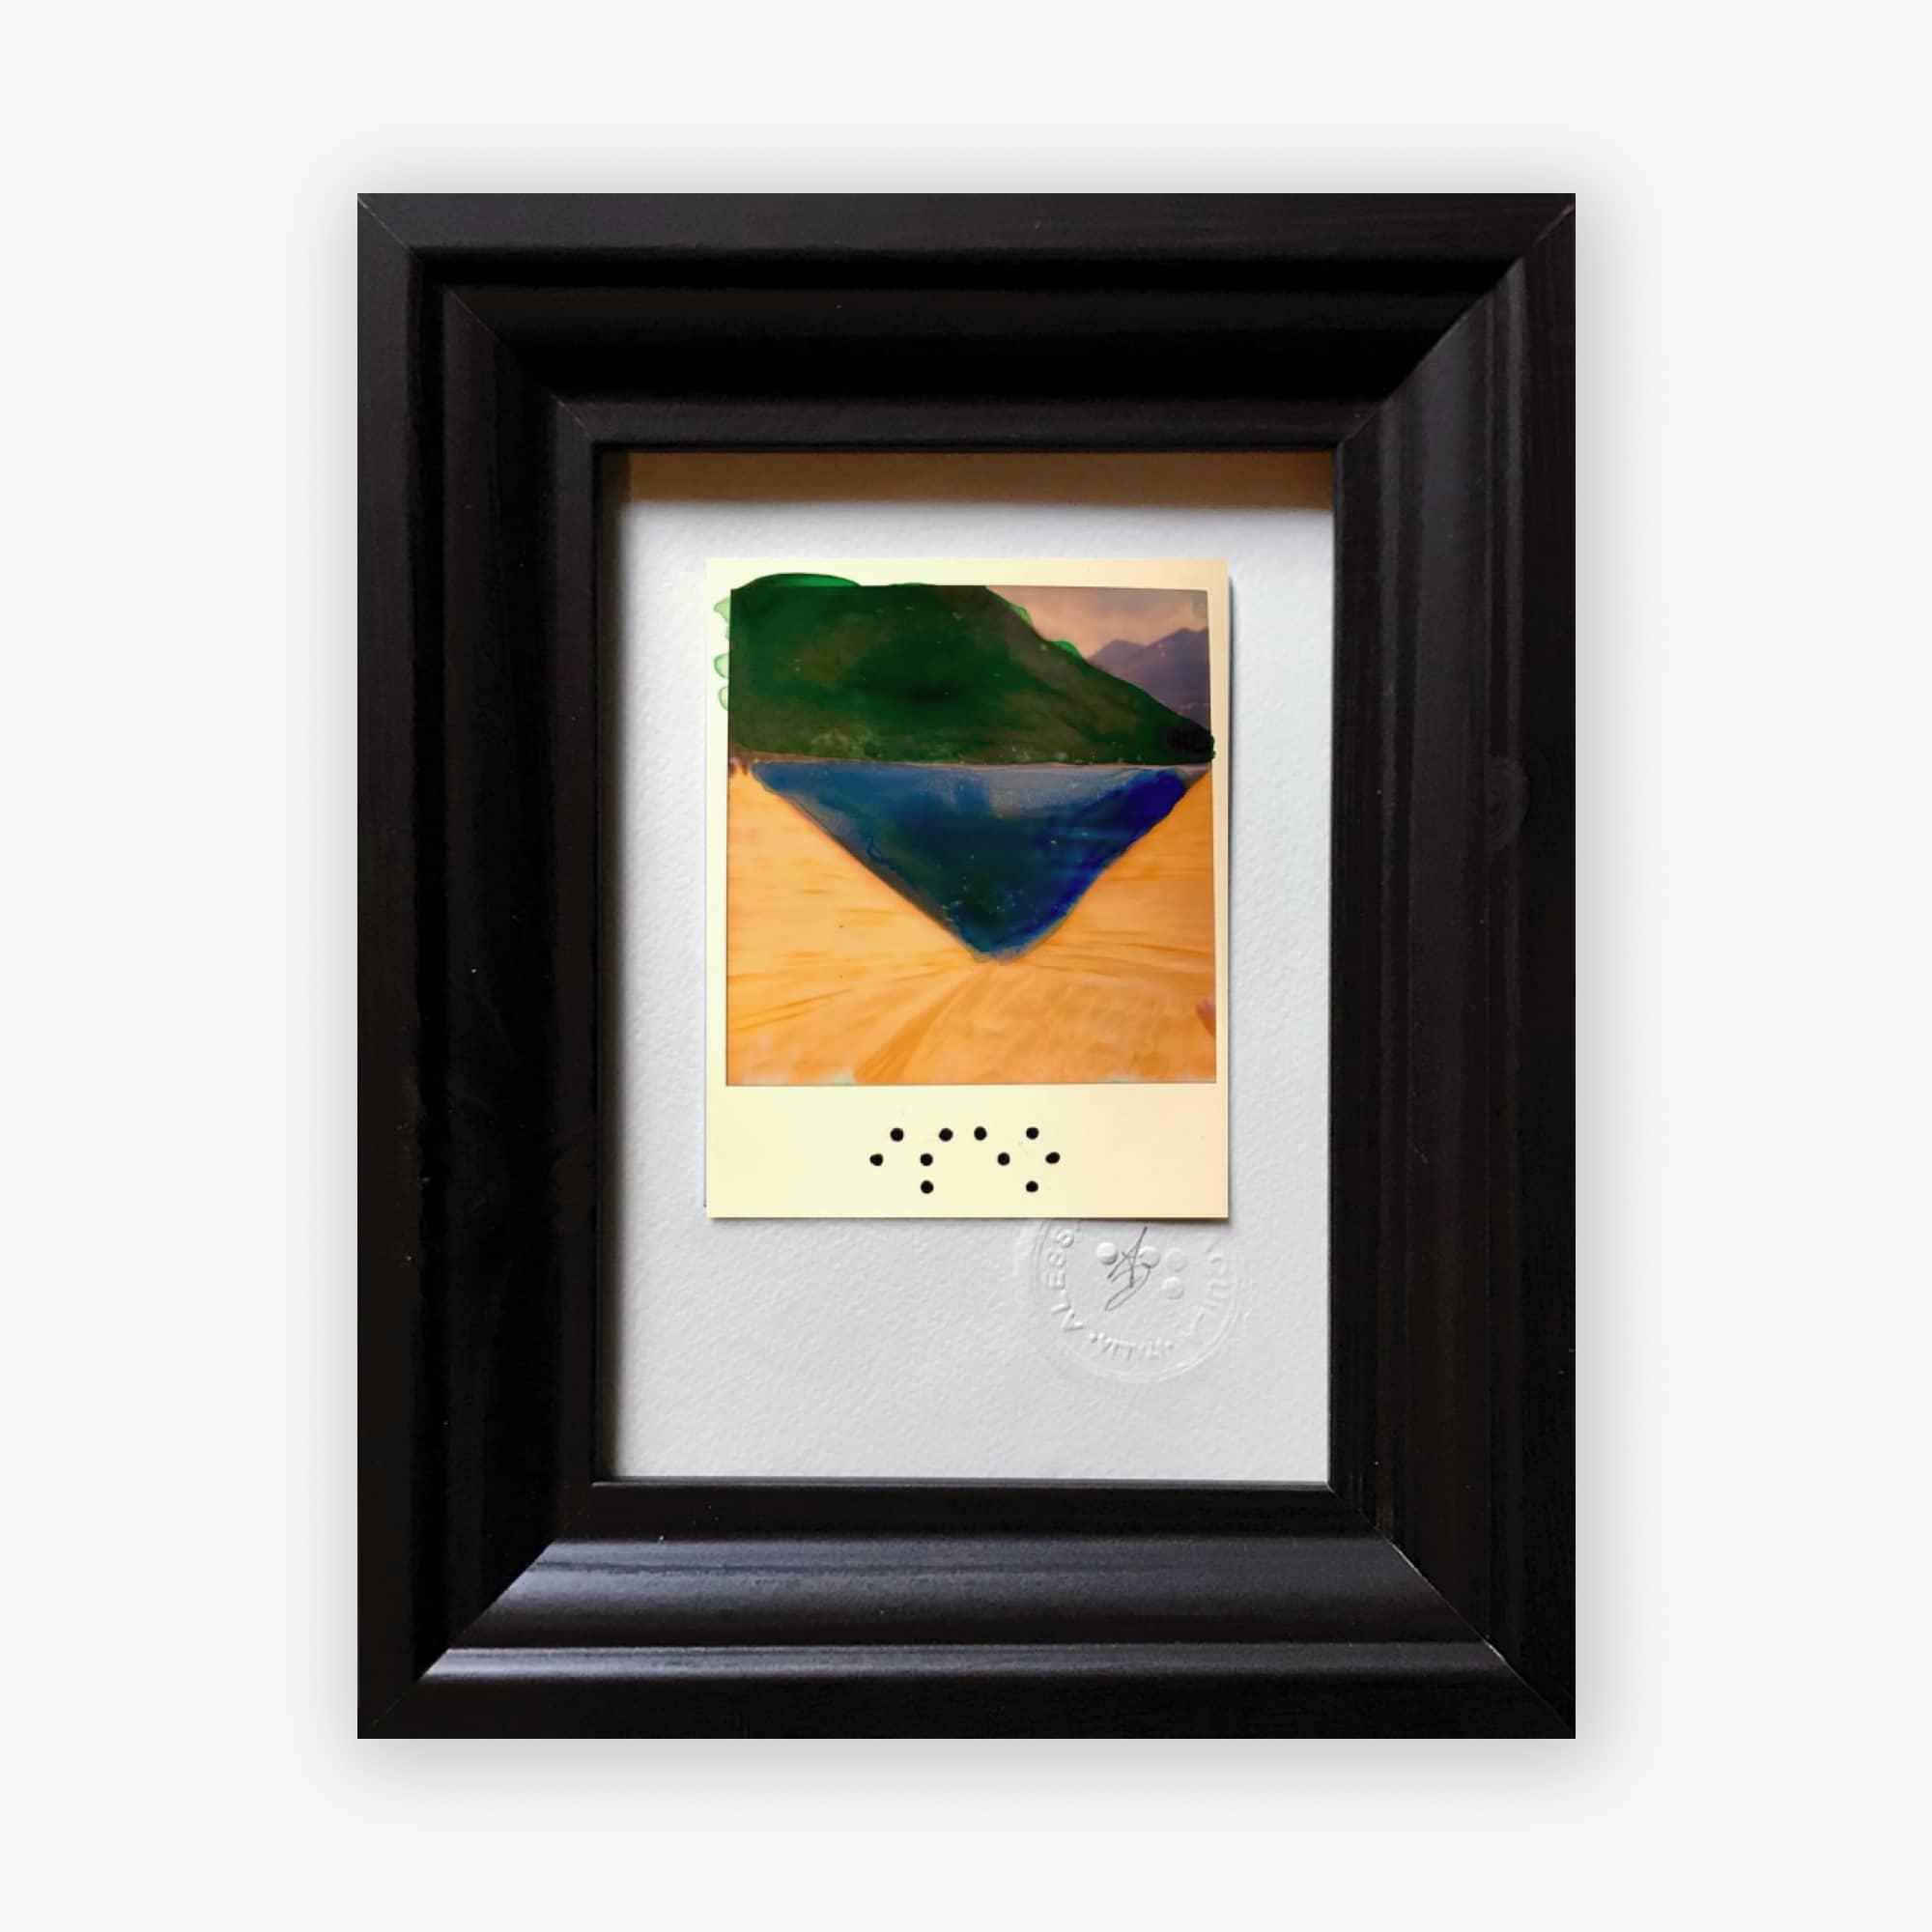 The Floating Polaroid #9